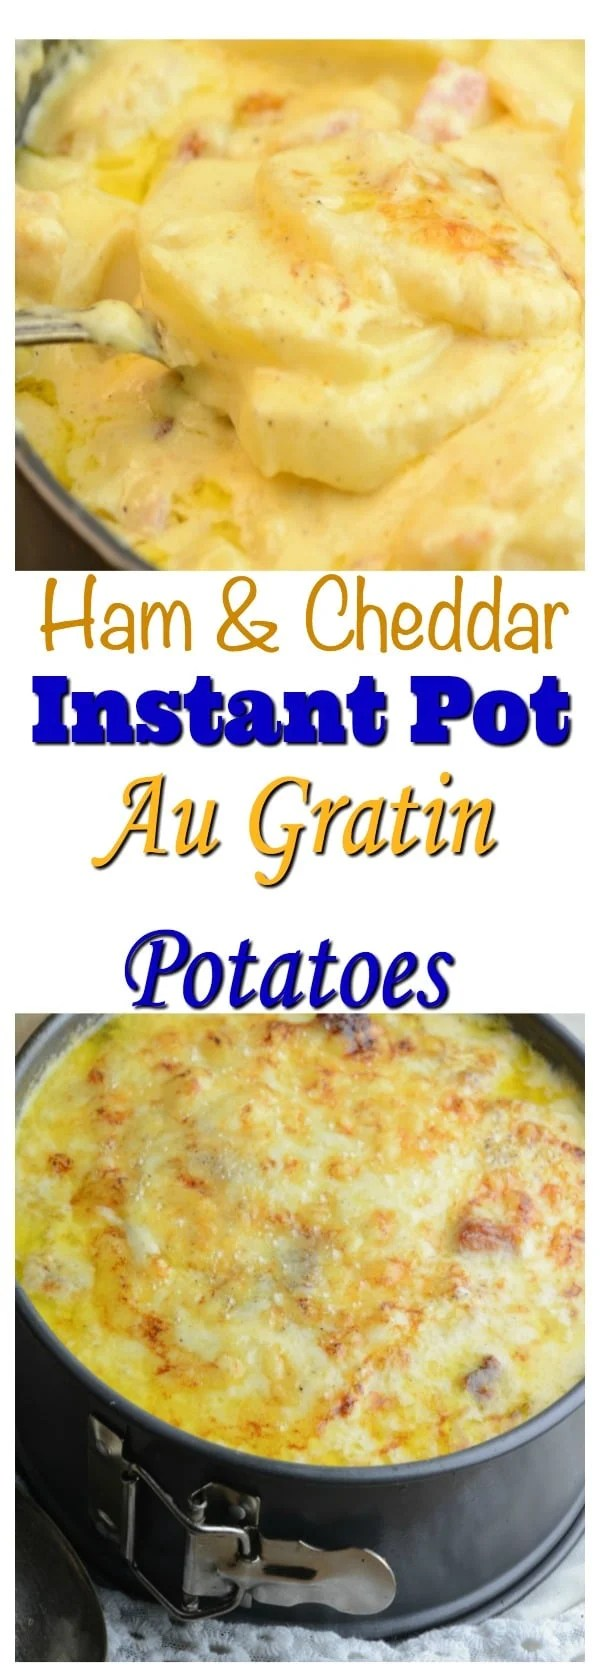 Ham & Chedder Instant Pot Augratin Potatoes